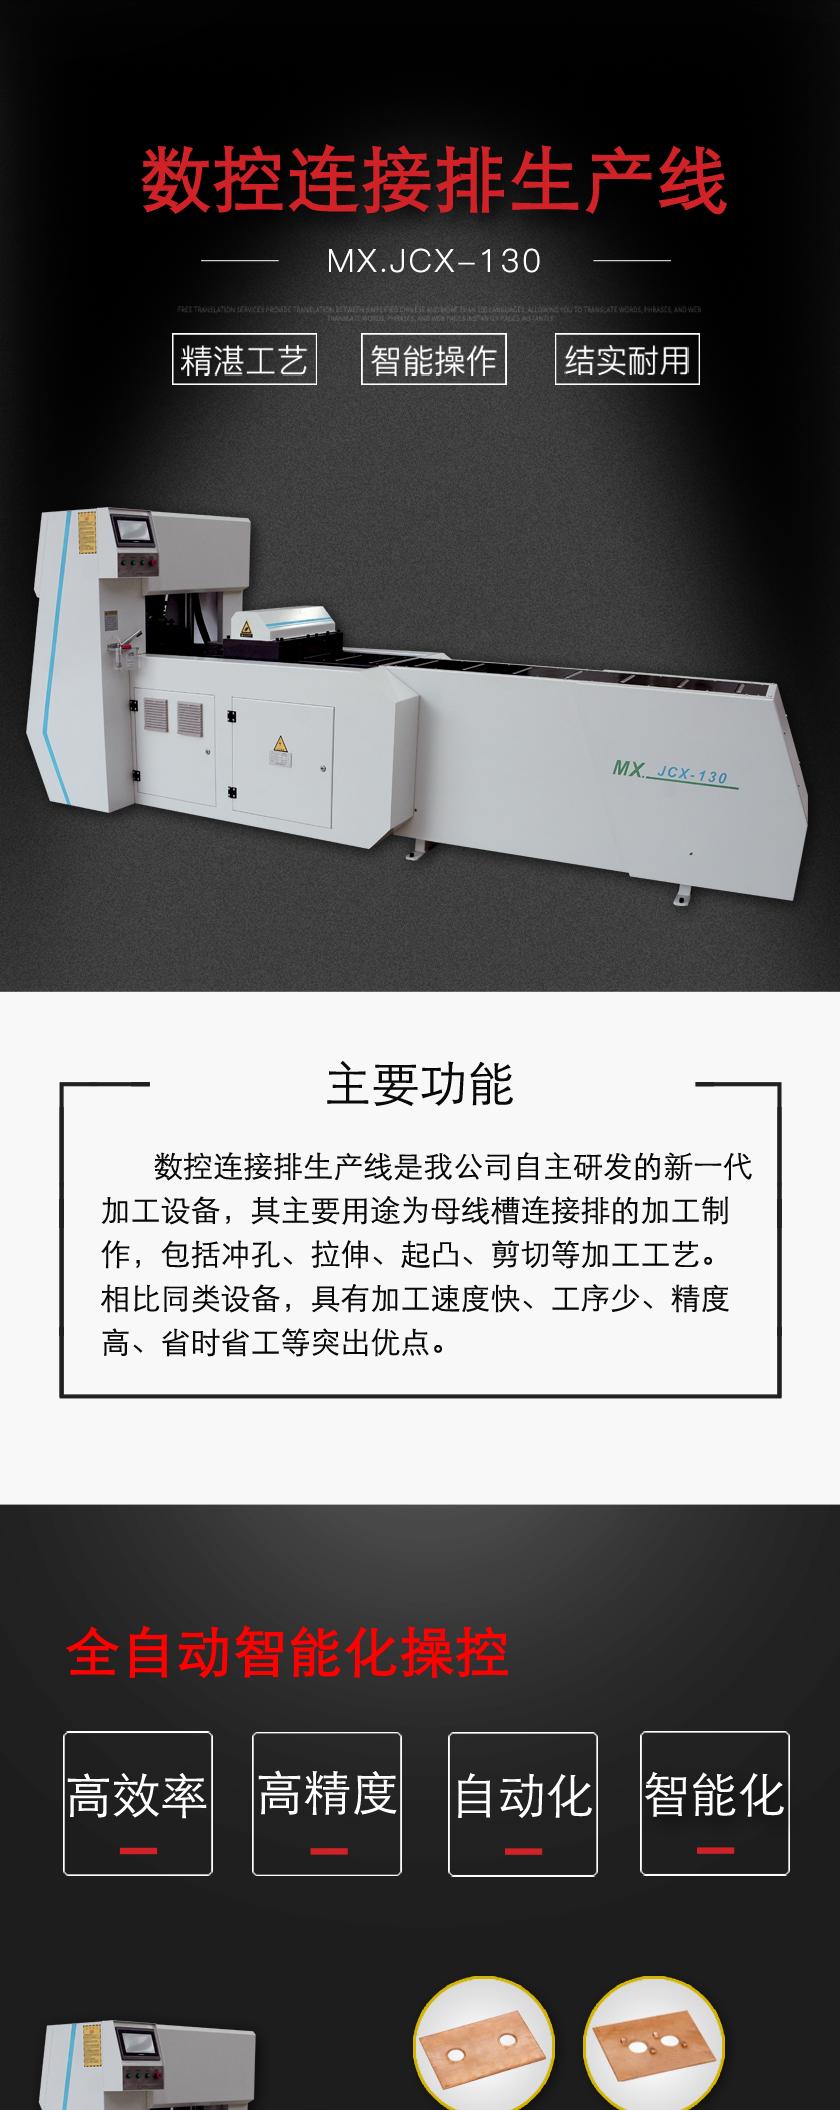 MX.JCX-130数控连接排生产线